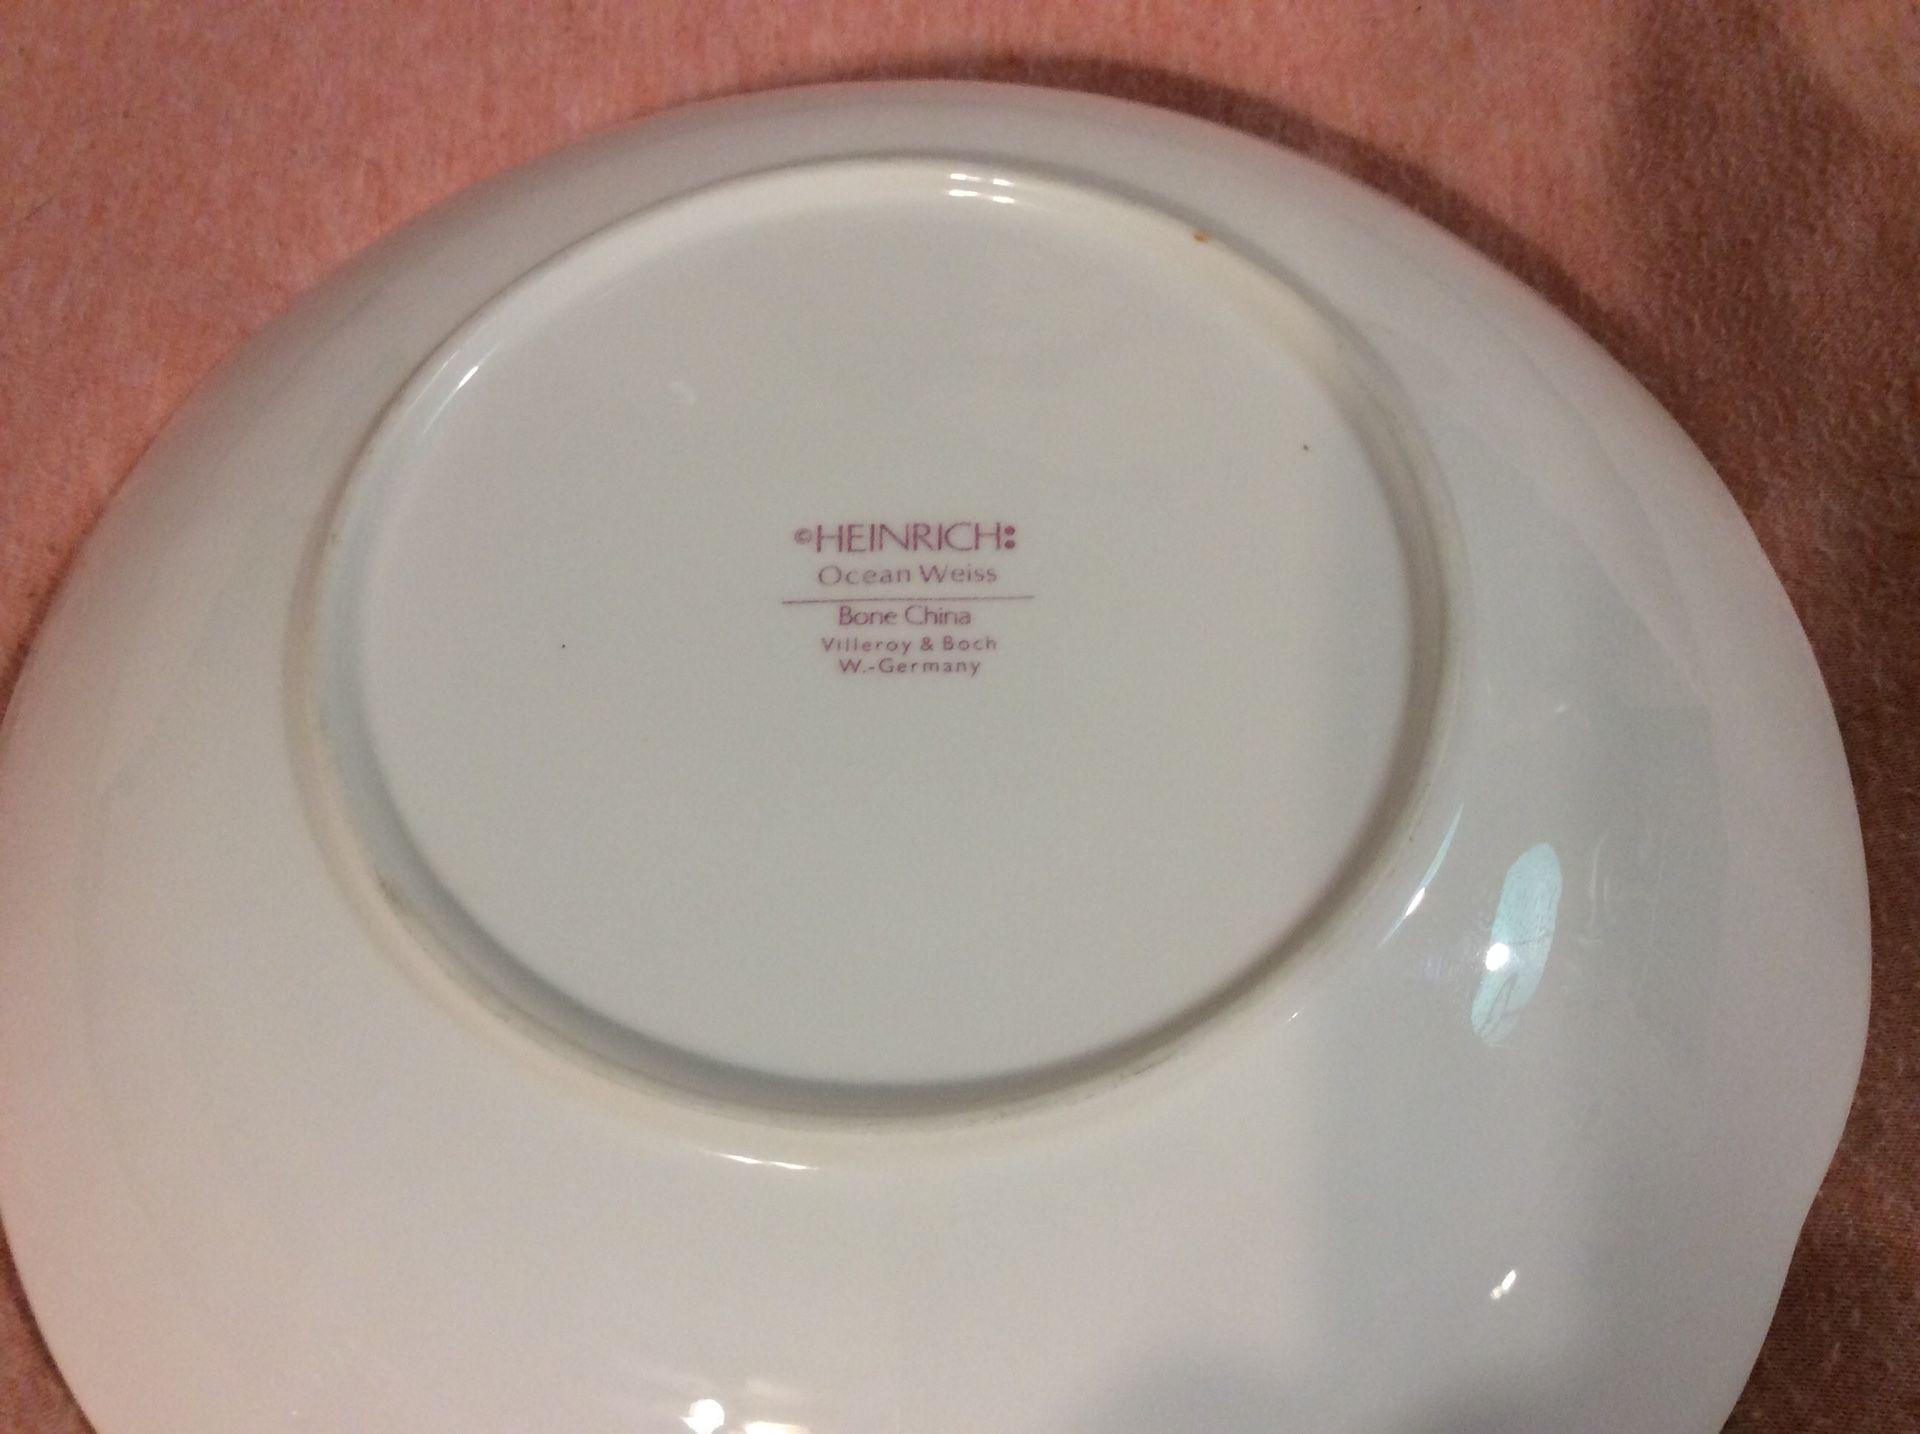 Rare set of 8 Villeroy & Boch Heinrich Ocean Weiss Bone China Soup Salad Cereal Bowls